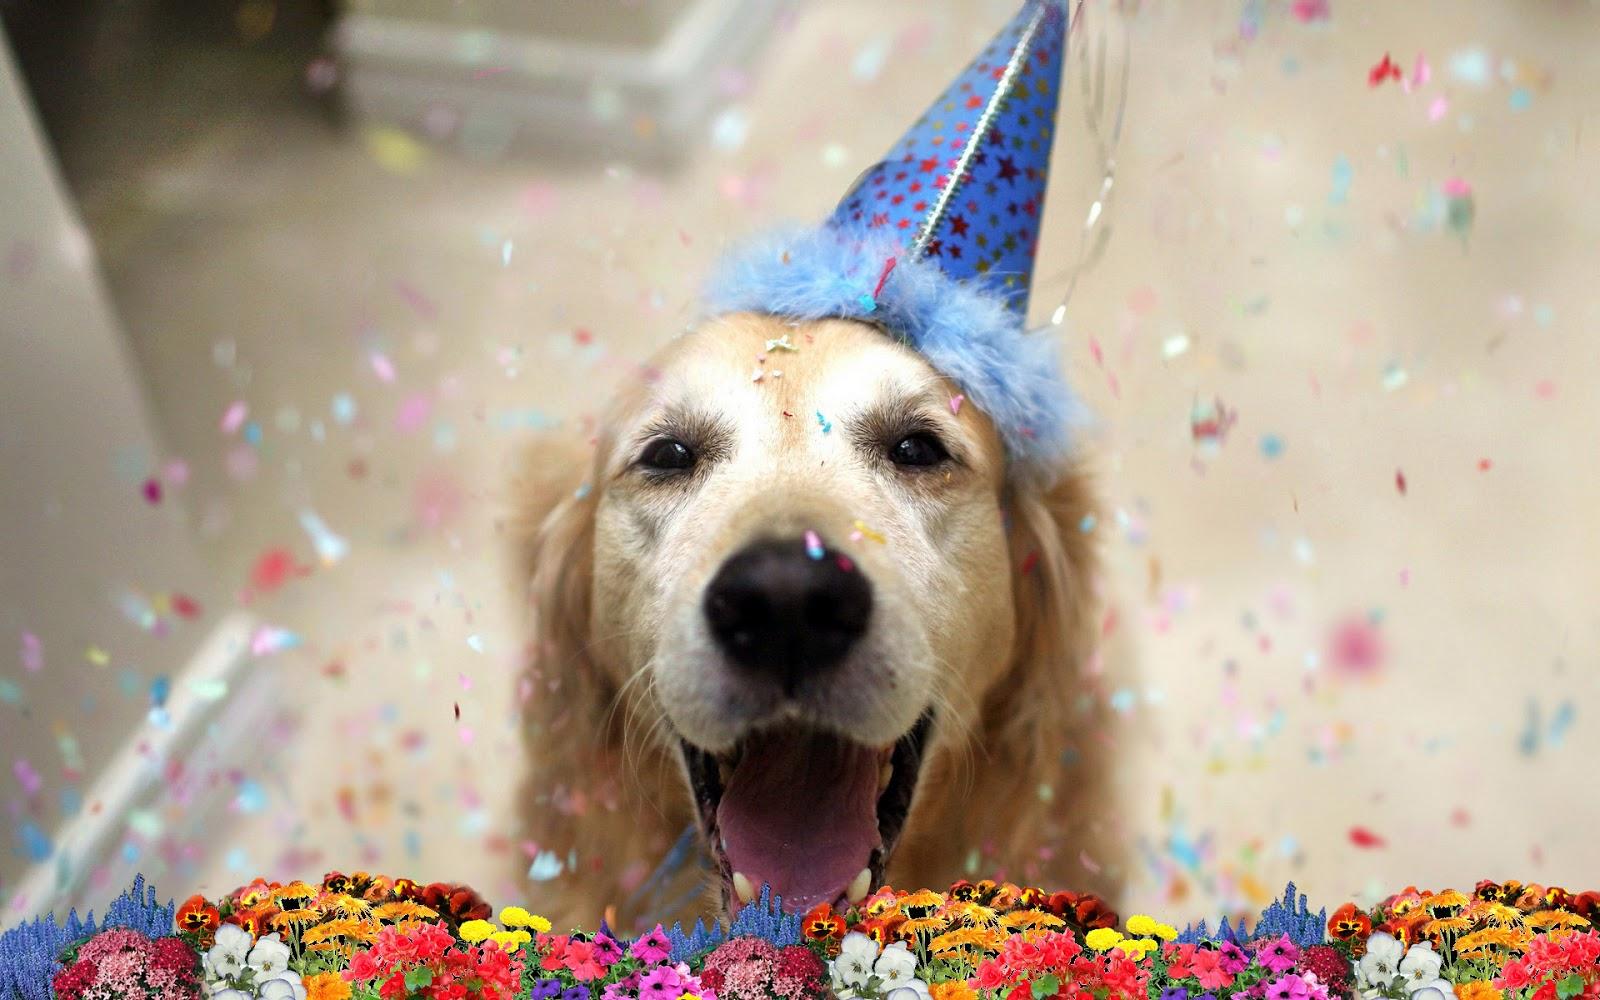 http://4.bp.blogspot.com/-vMVkxR2Xn54/UiB6ZvMiyPI/AAAAAAAAQ7Y/F7FgiqaVgl8/s1600/foto-hond-verjaardag-bloemen-achtergrond.jpg